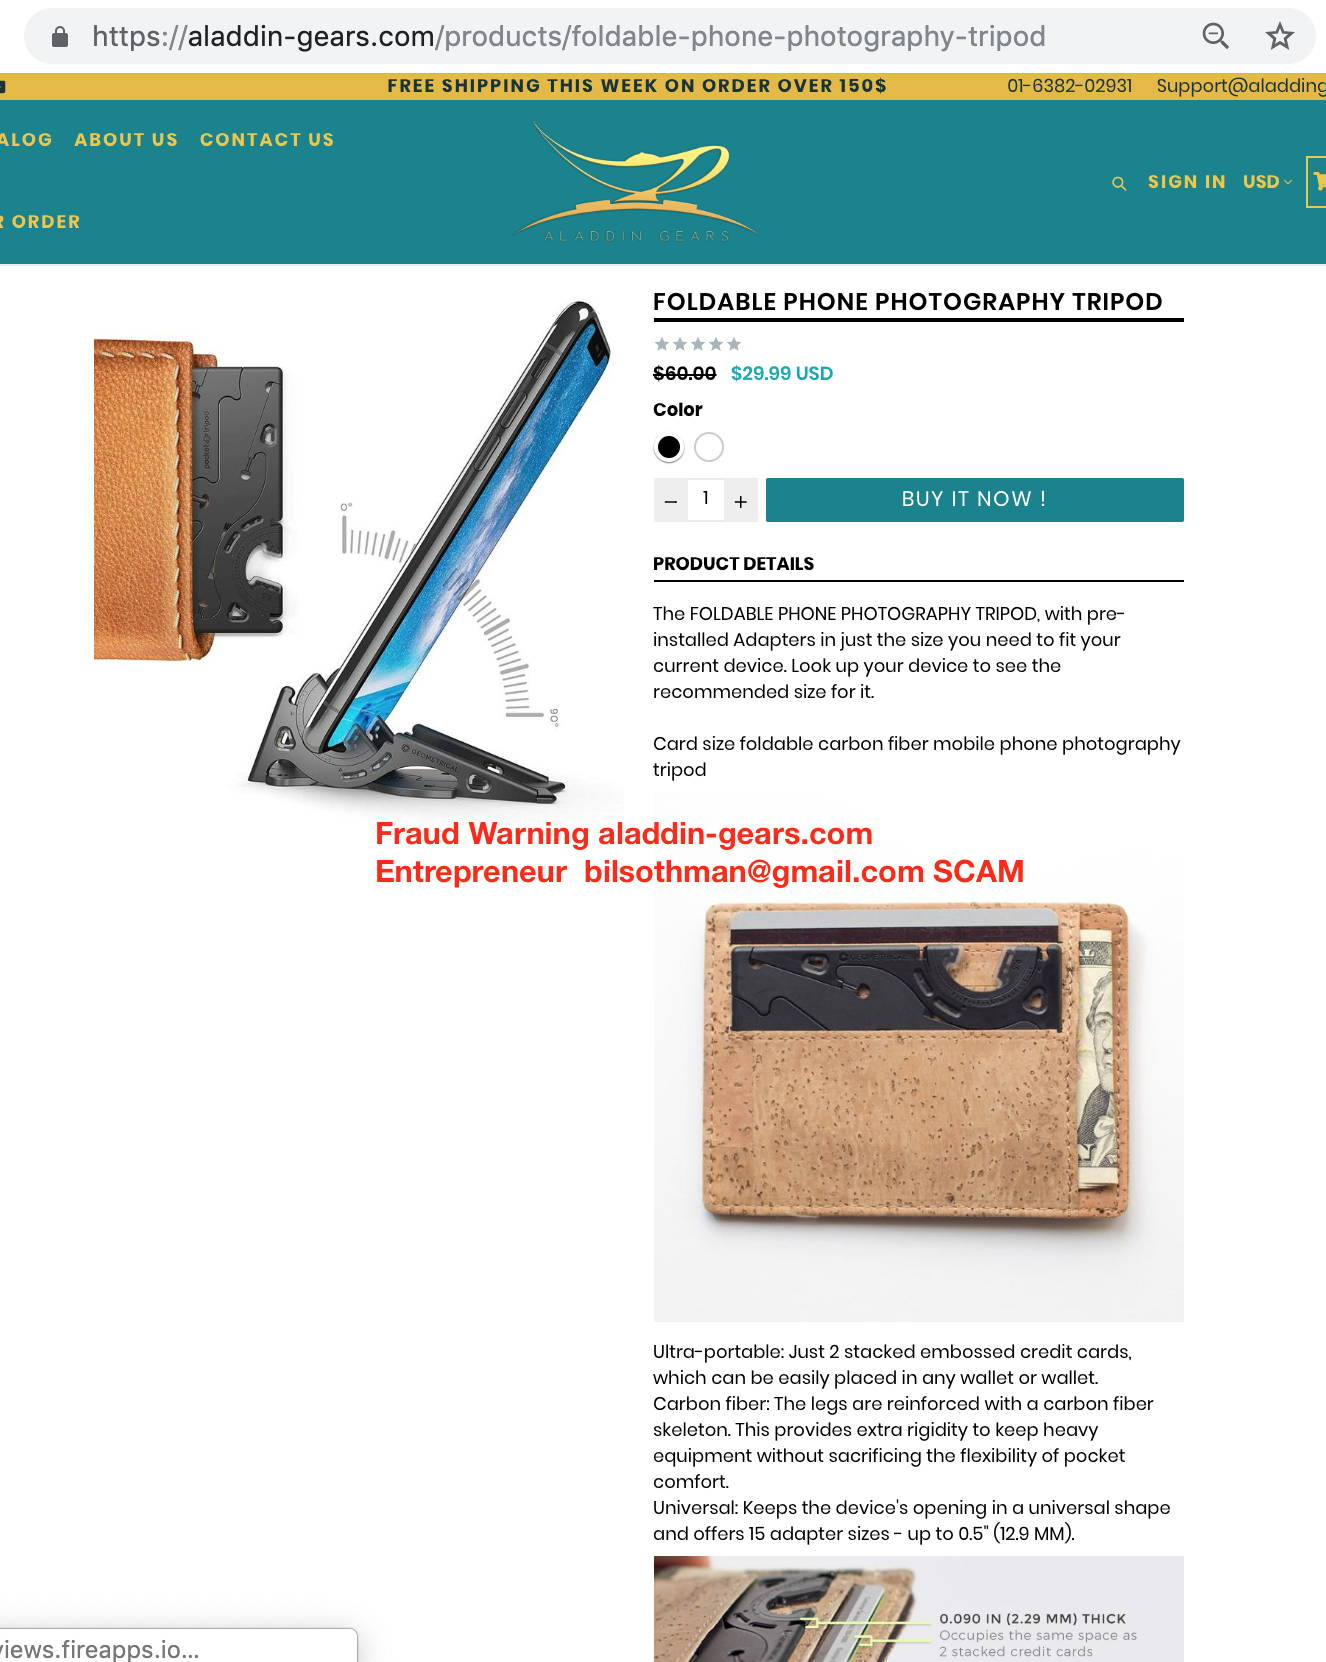 Fraud Warning aladdin-gears.com Entrepreneur  bilsothman@gmail.com SCAM